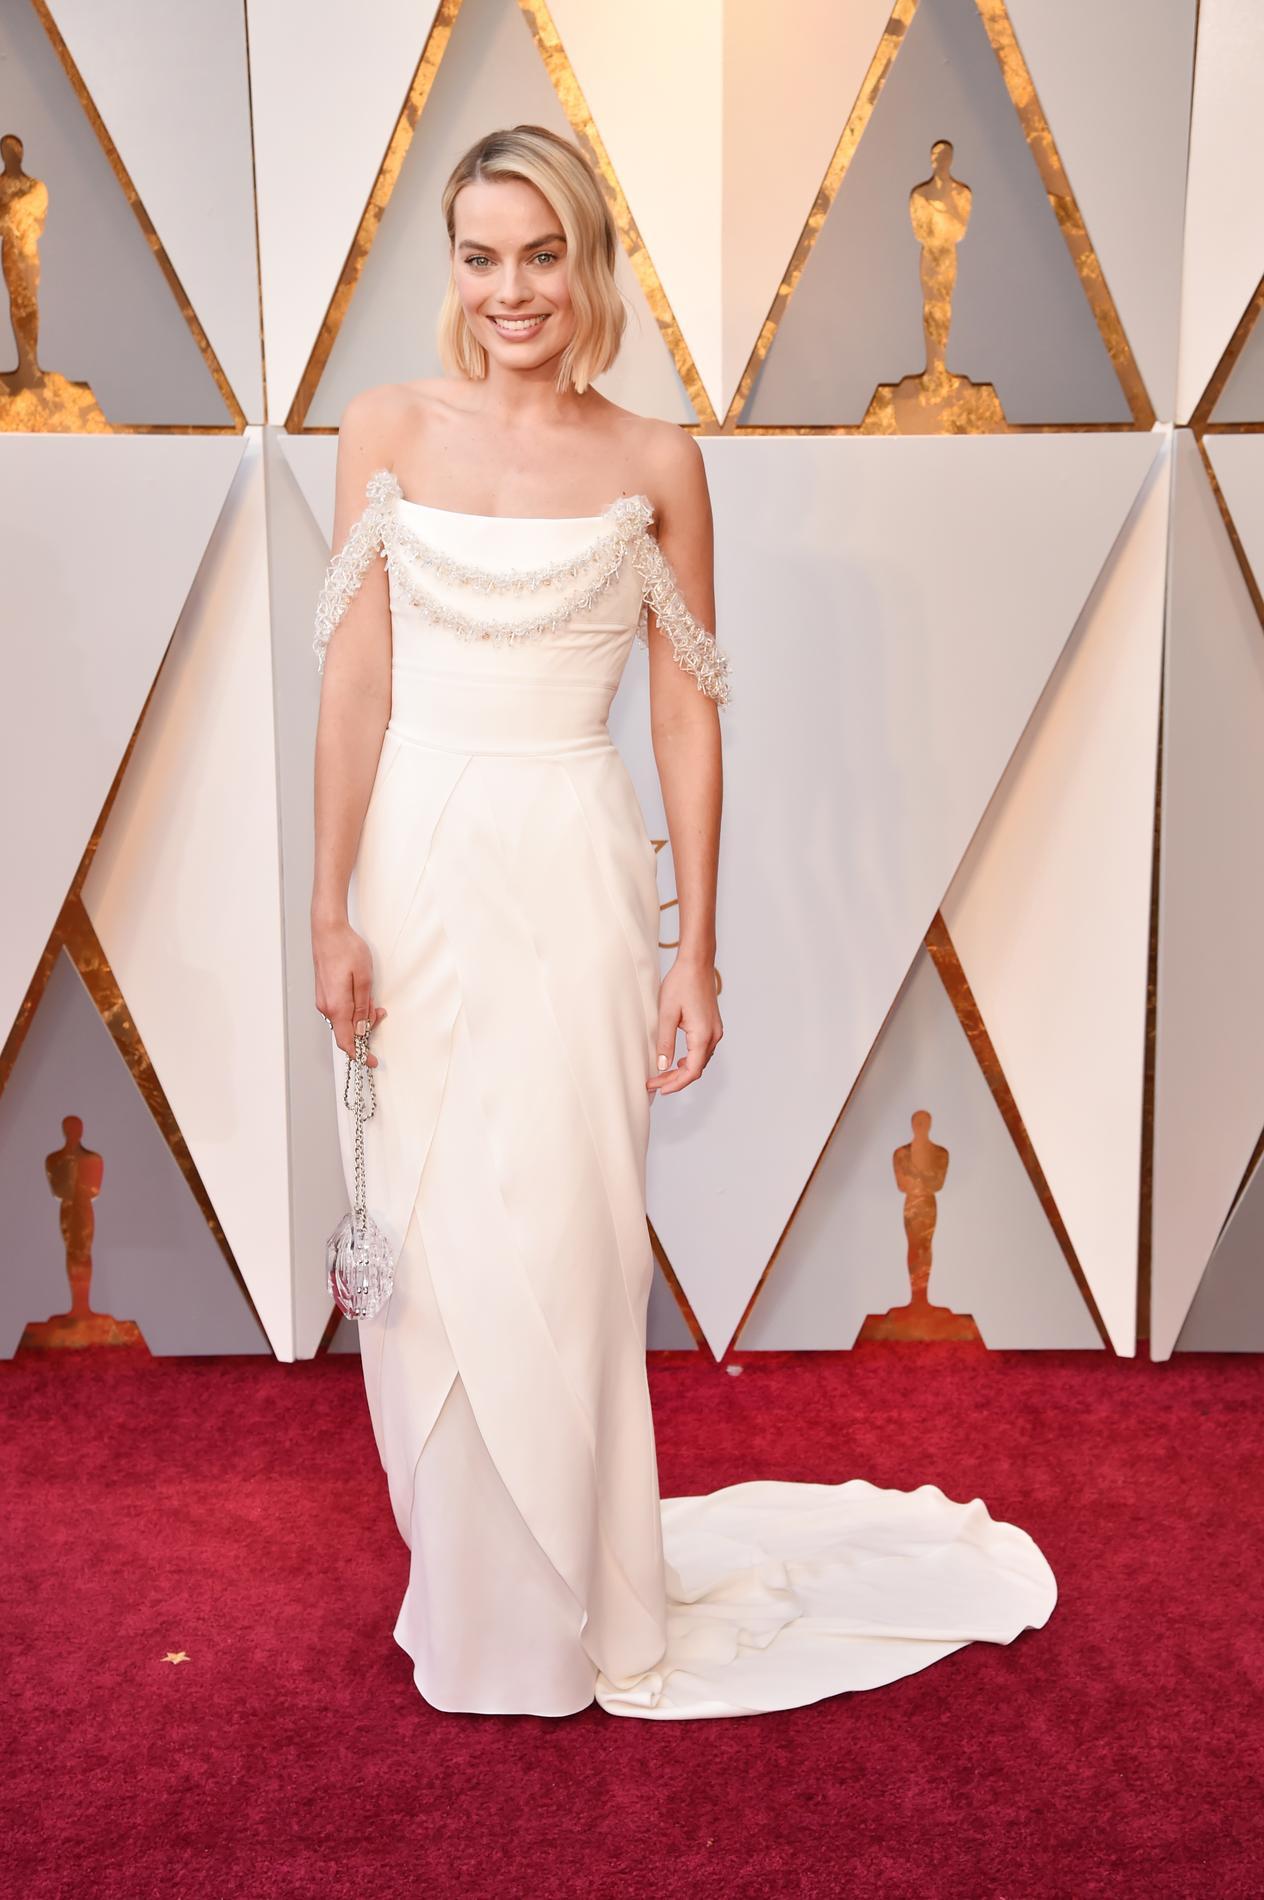 Plus belles robes oscar 2019